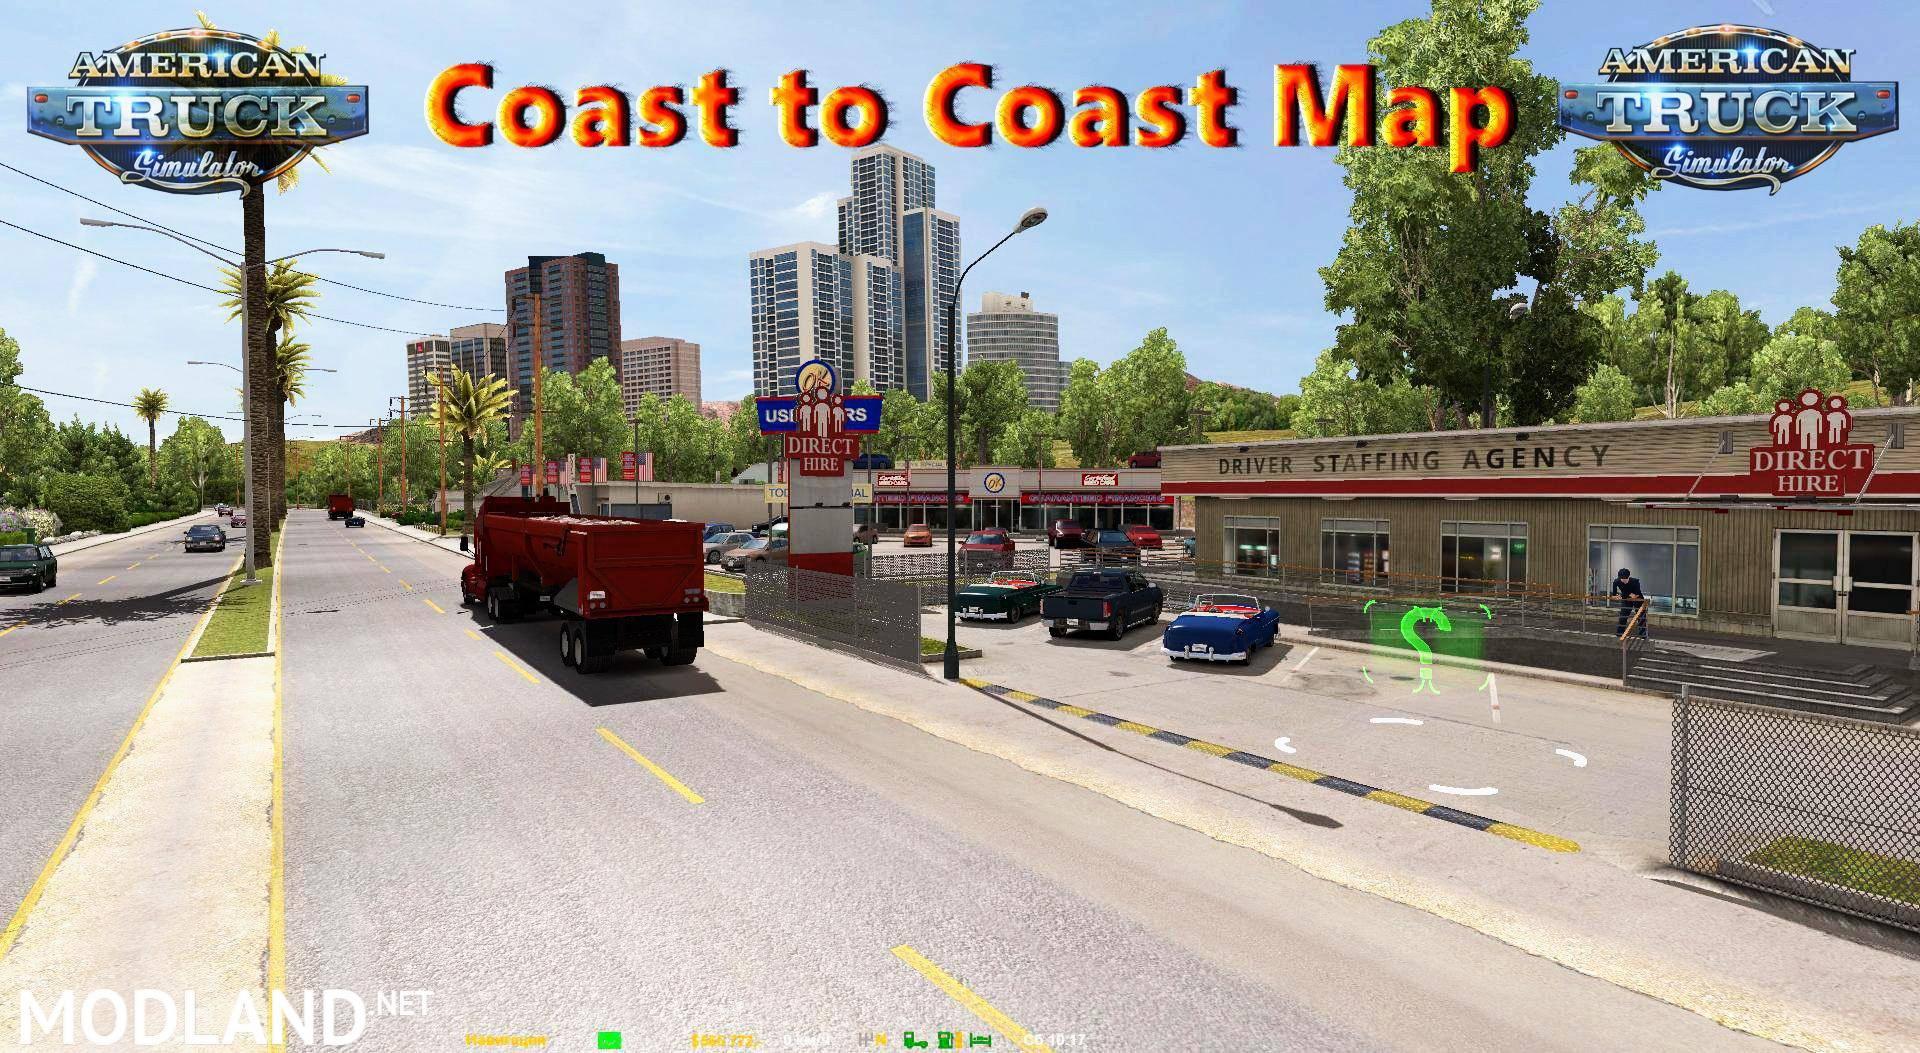 Coast to Coast Map v24 Released